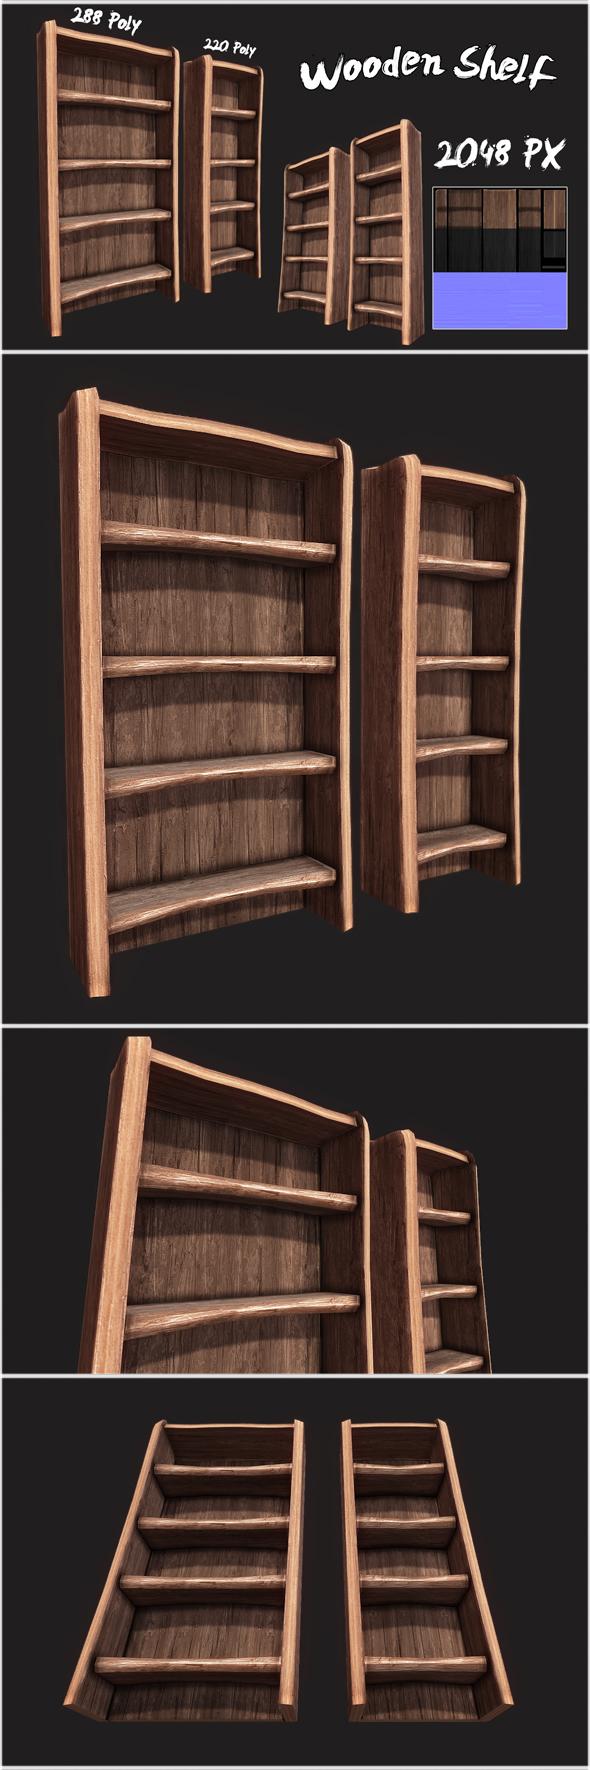 Rustic Wooden Shelf 01 - 3DOcean Item for Sale